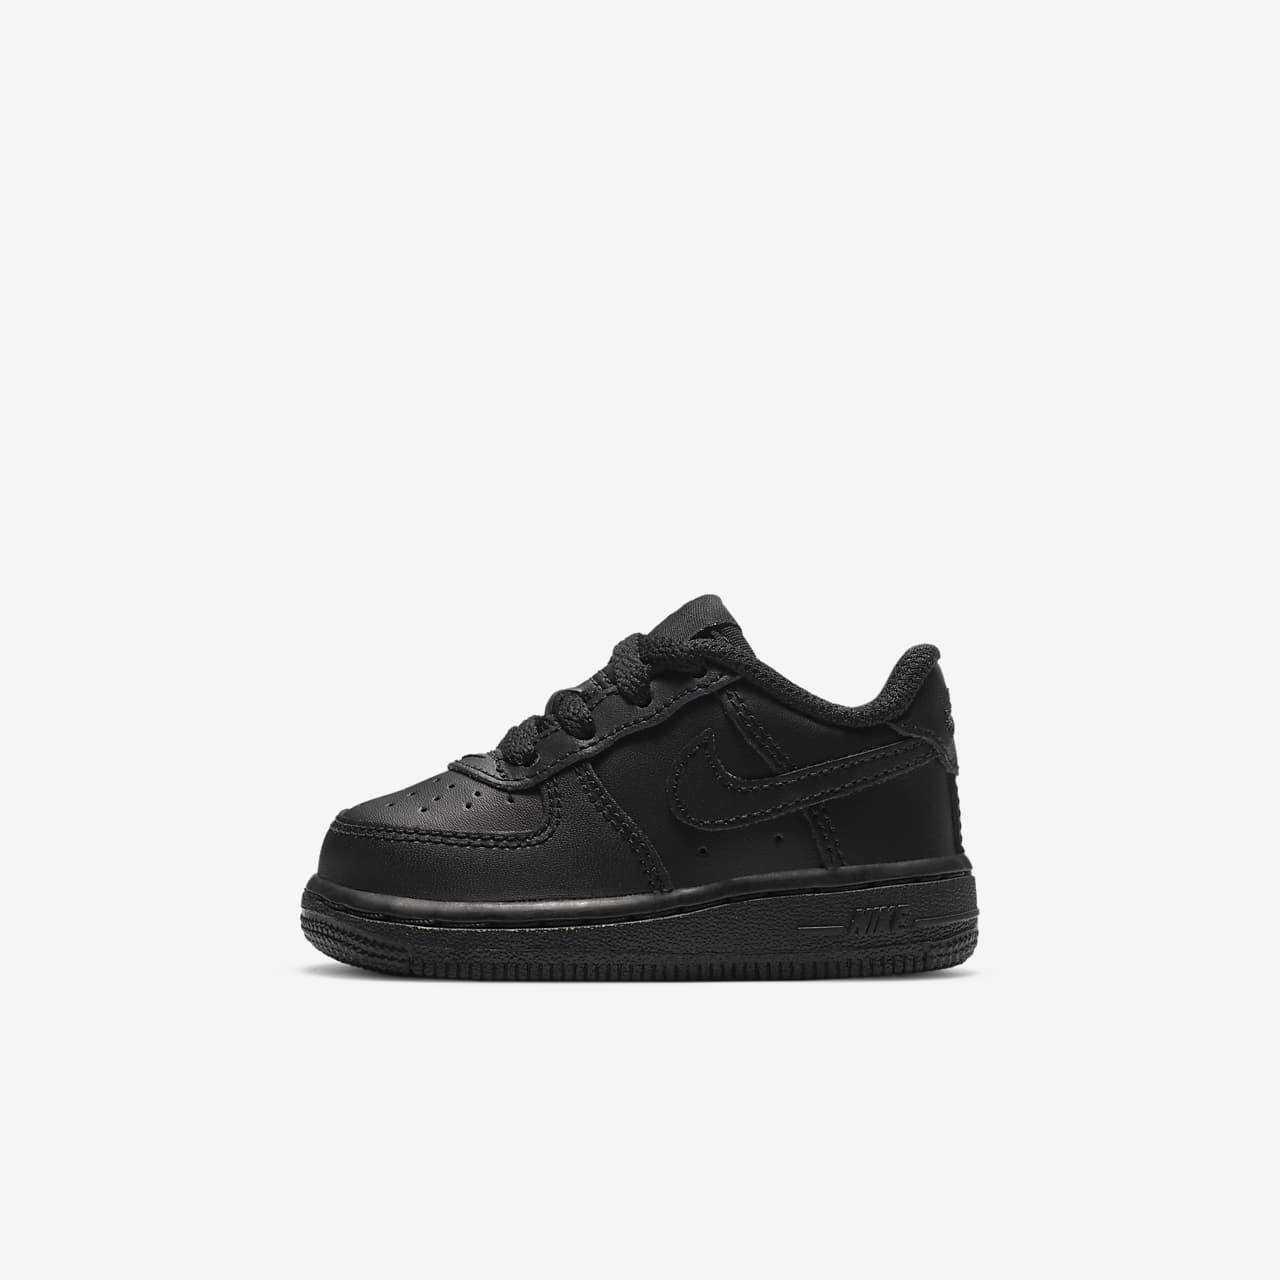 cheap for discount 39c1f 73e57 Force BabyspeutersBe Nike Schoen Air Voor 1 06 ARj543L